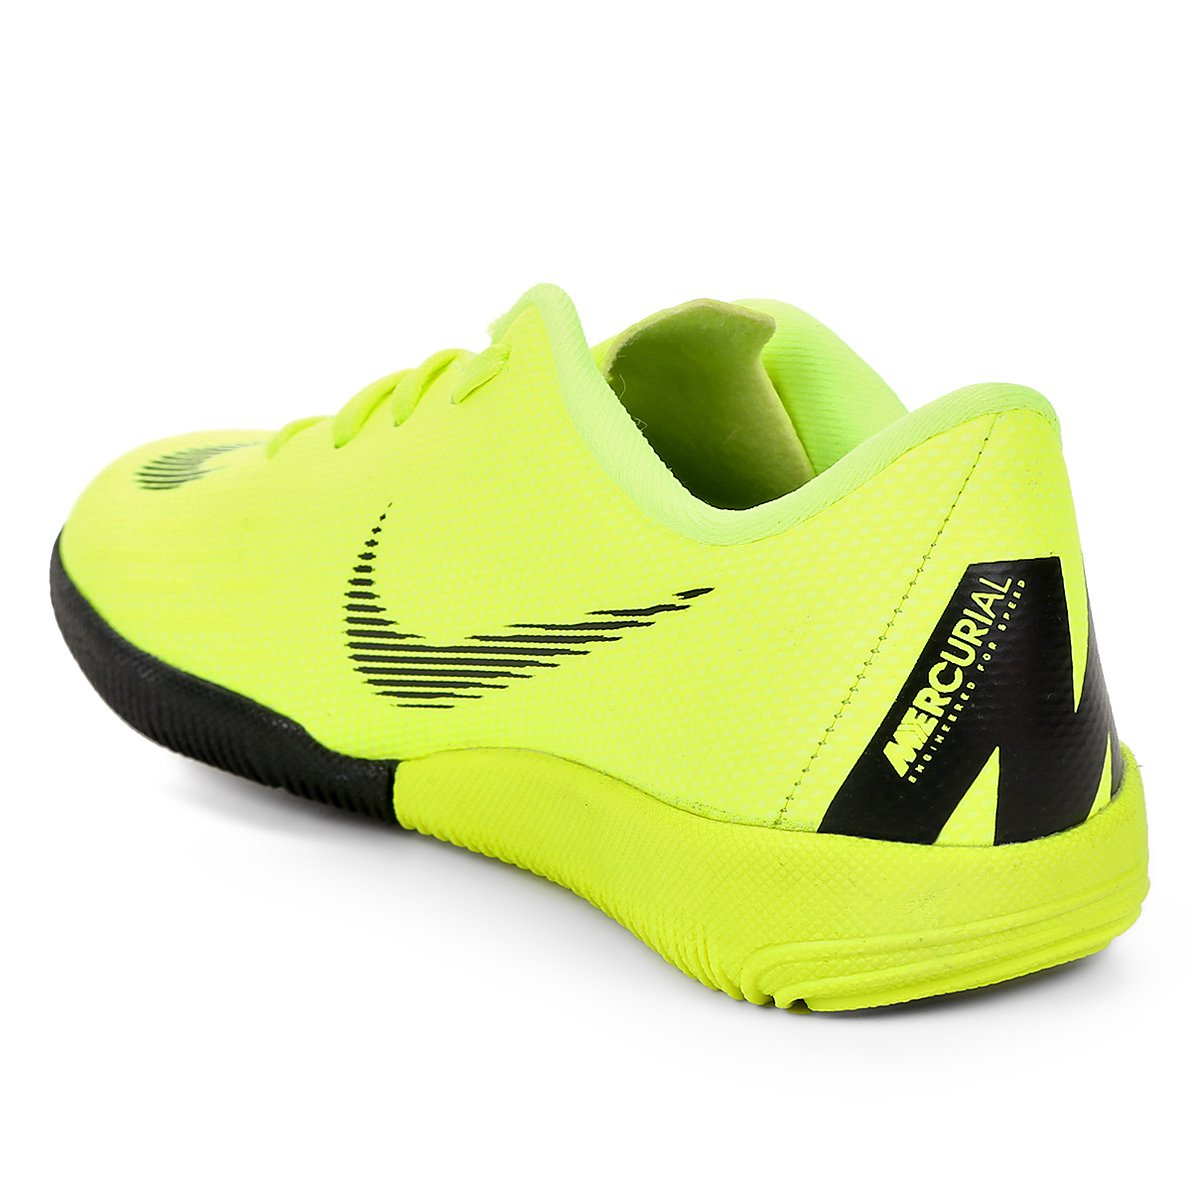 Chuteira Futsal Infantil Nike Mercurial Vapor 12 Academy - Amarelo e ... 82f28fadd47be